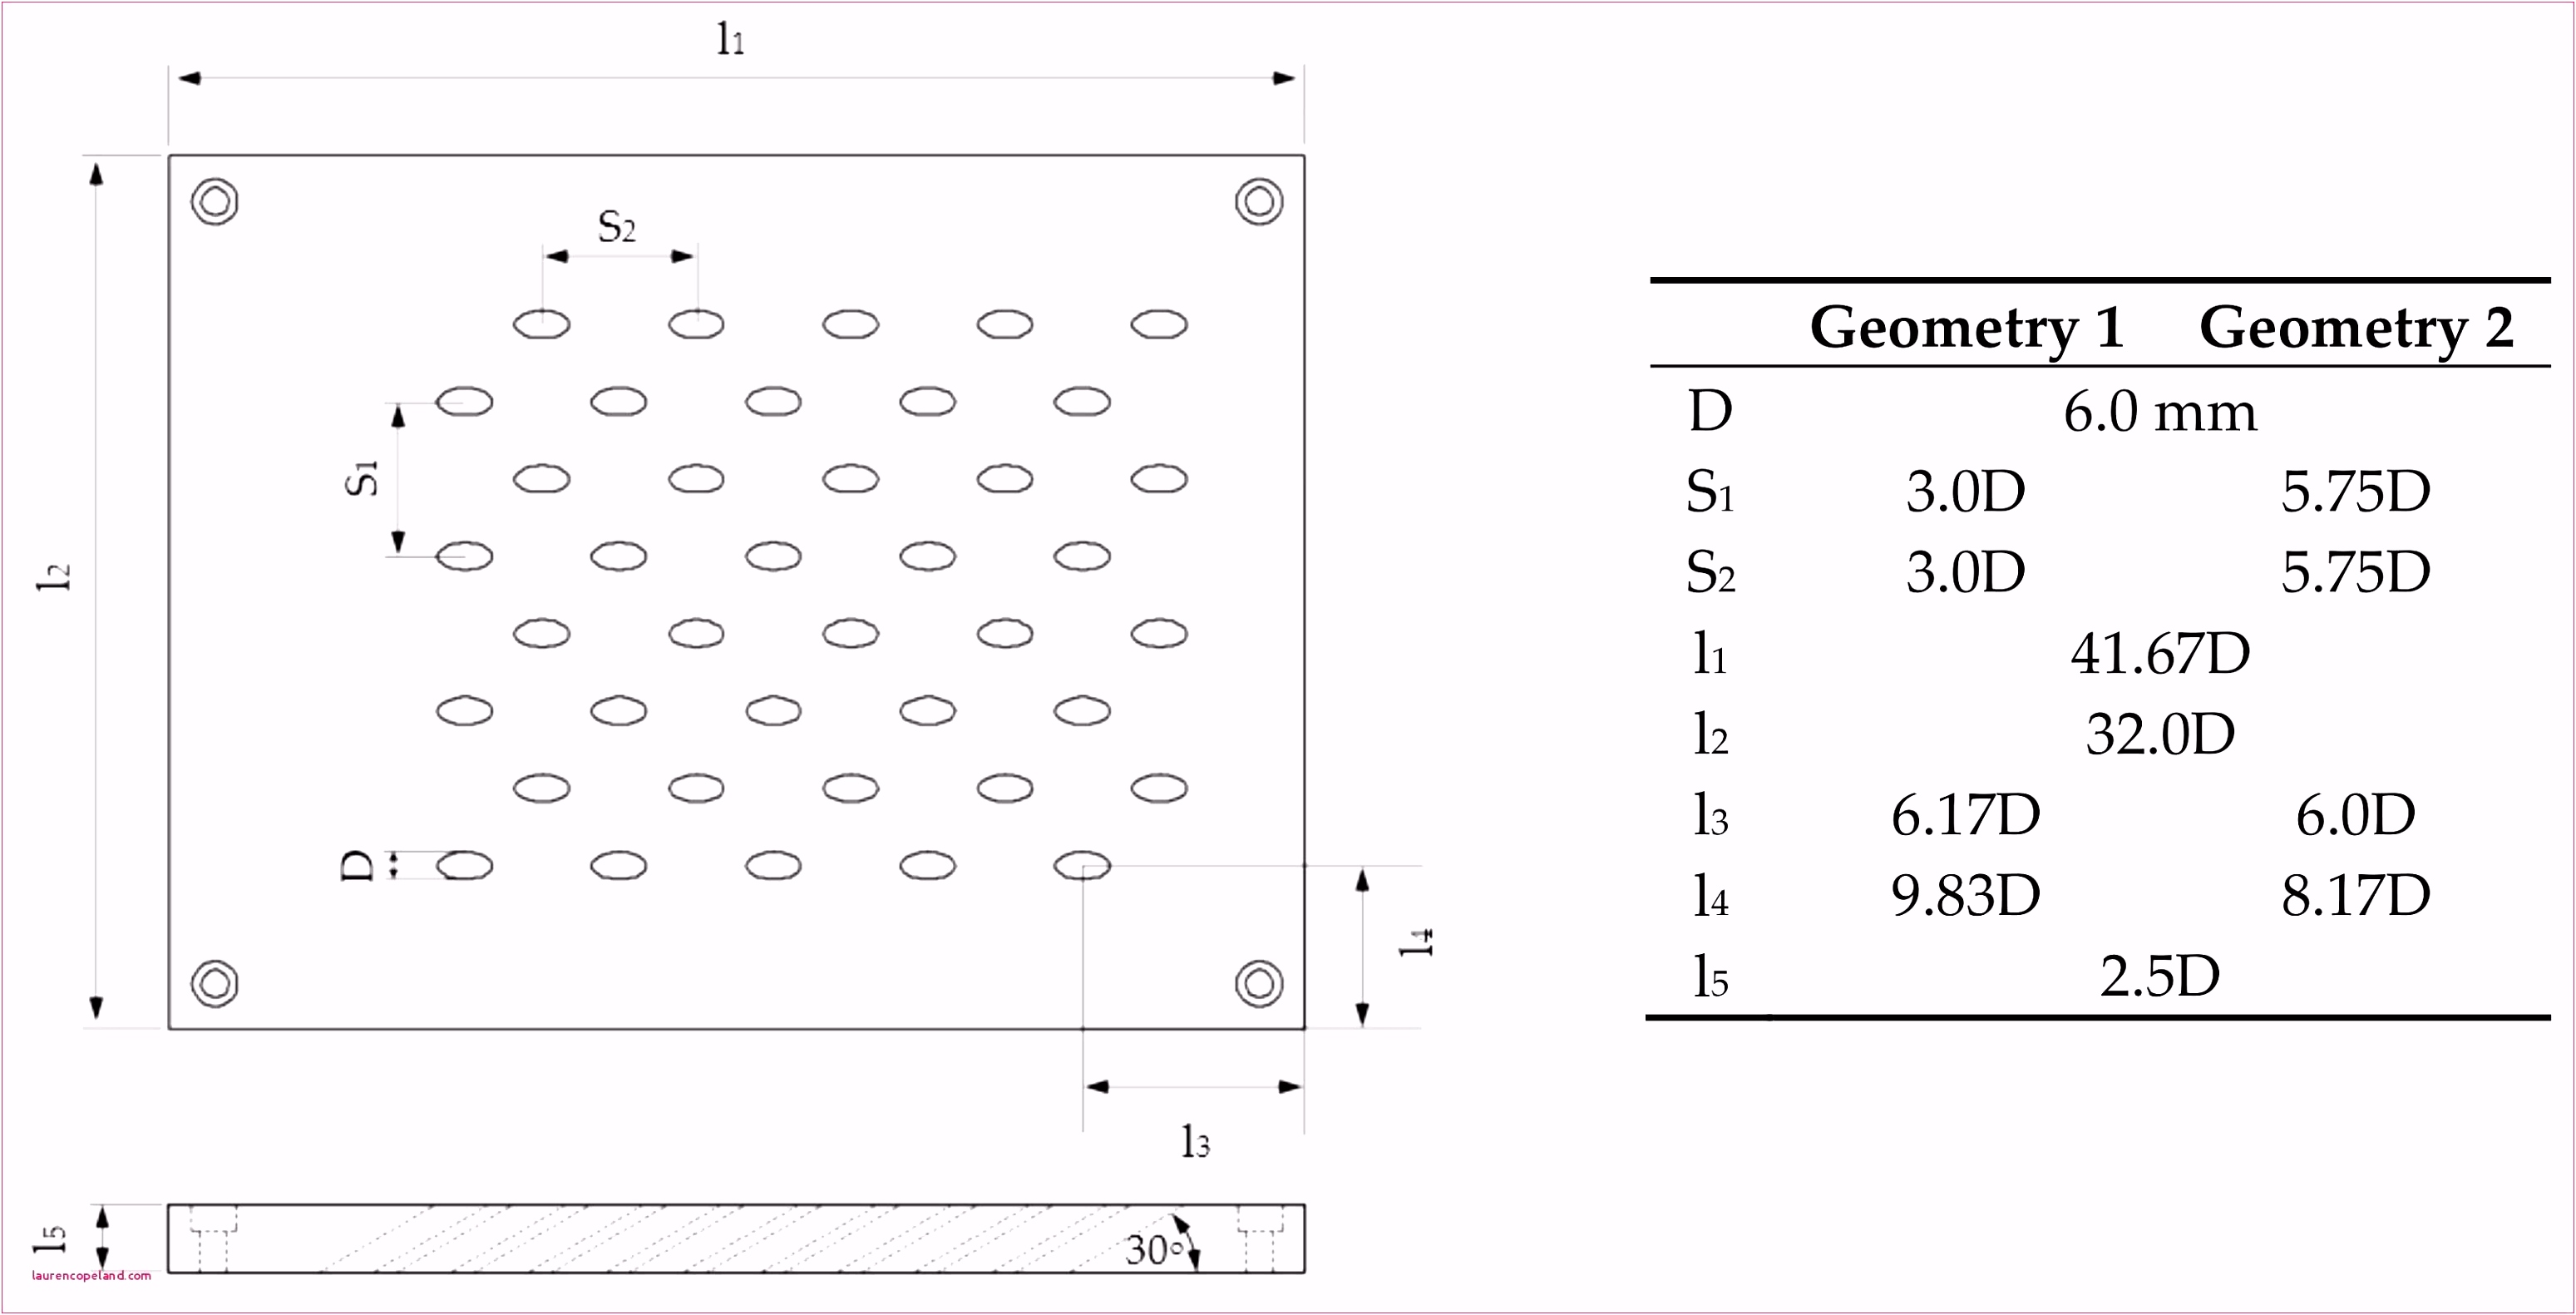 Herma Com Vorlagen Herma Cd Etiketten Vorlage Herma ordneretik Movab 192x61 25 Bl Din U1wj86itc6 C6reshcvtv